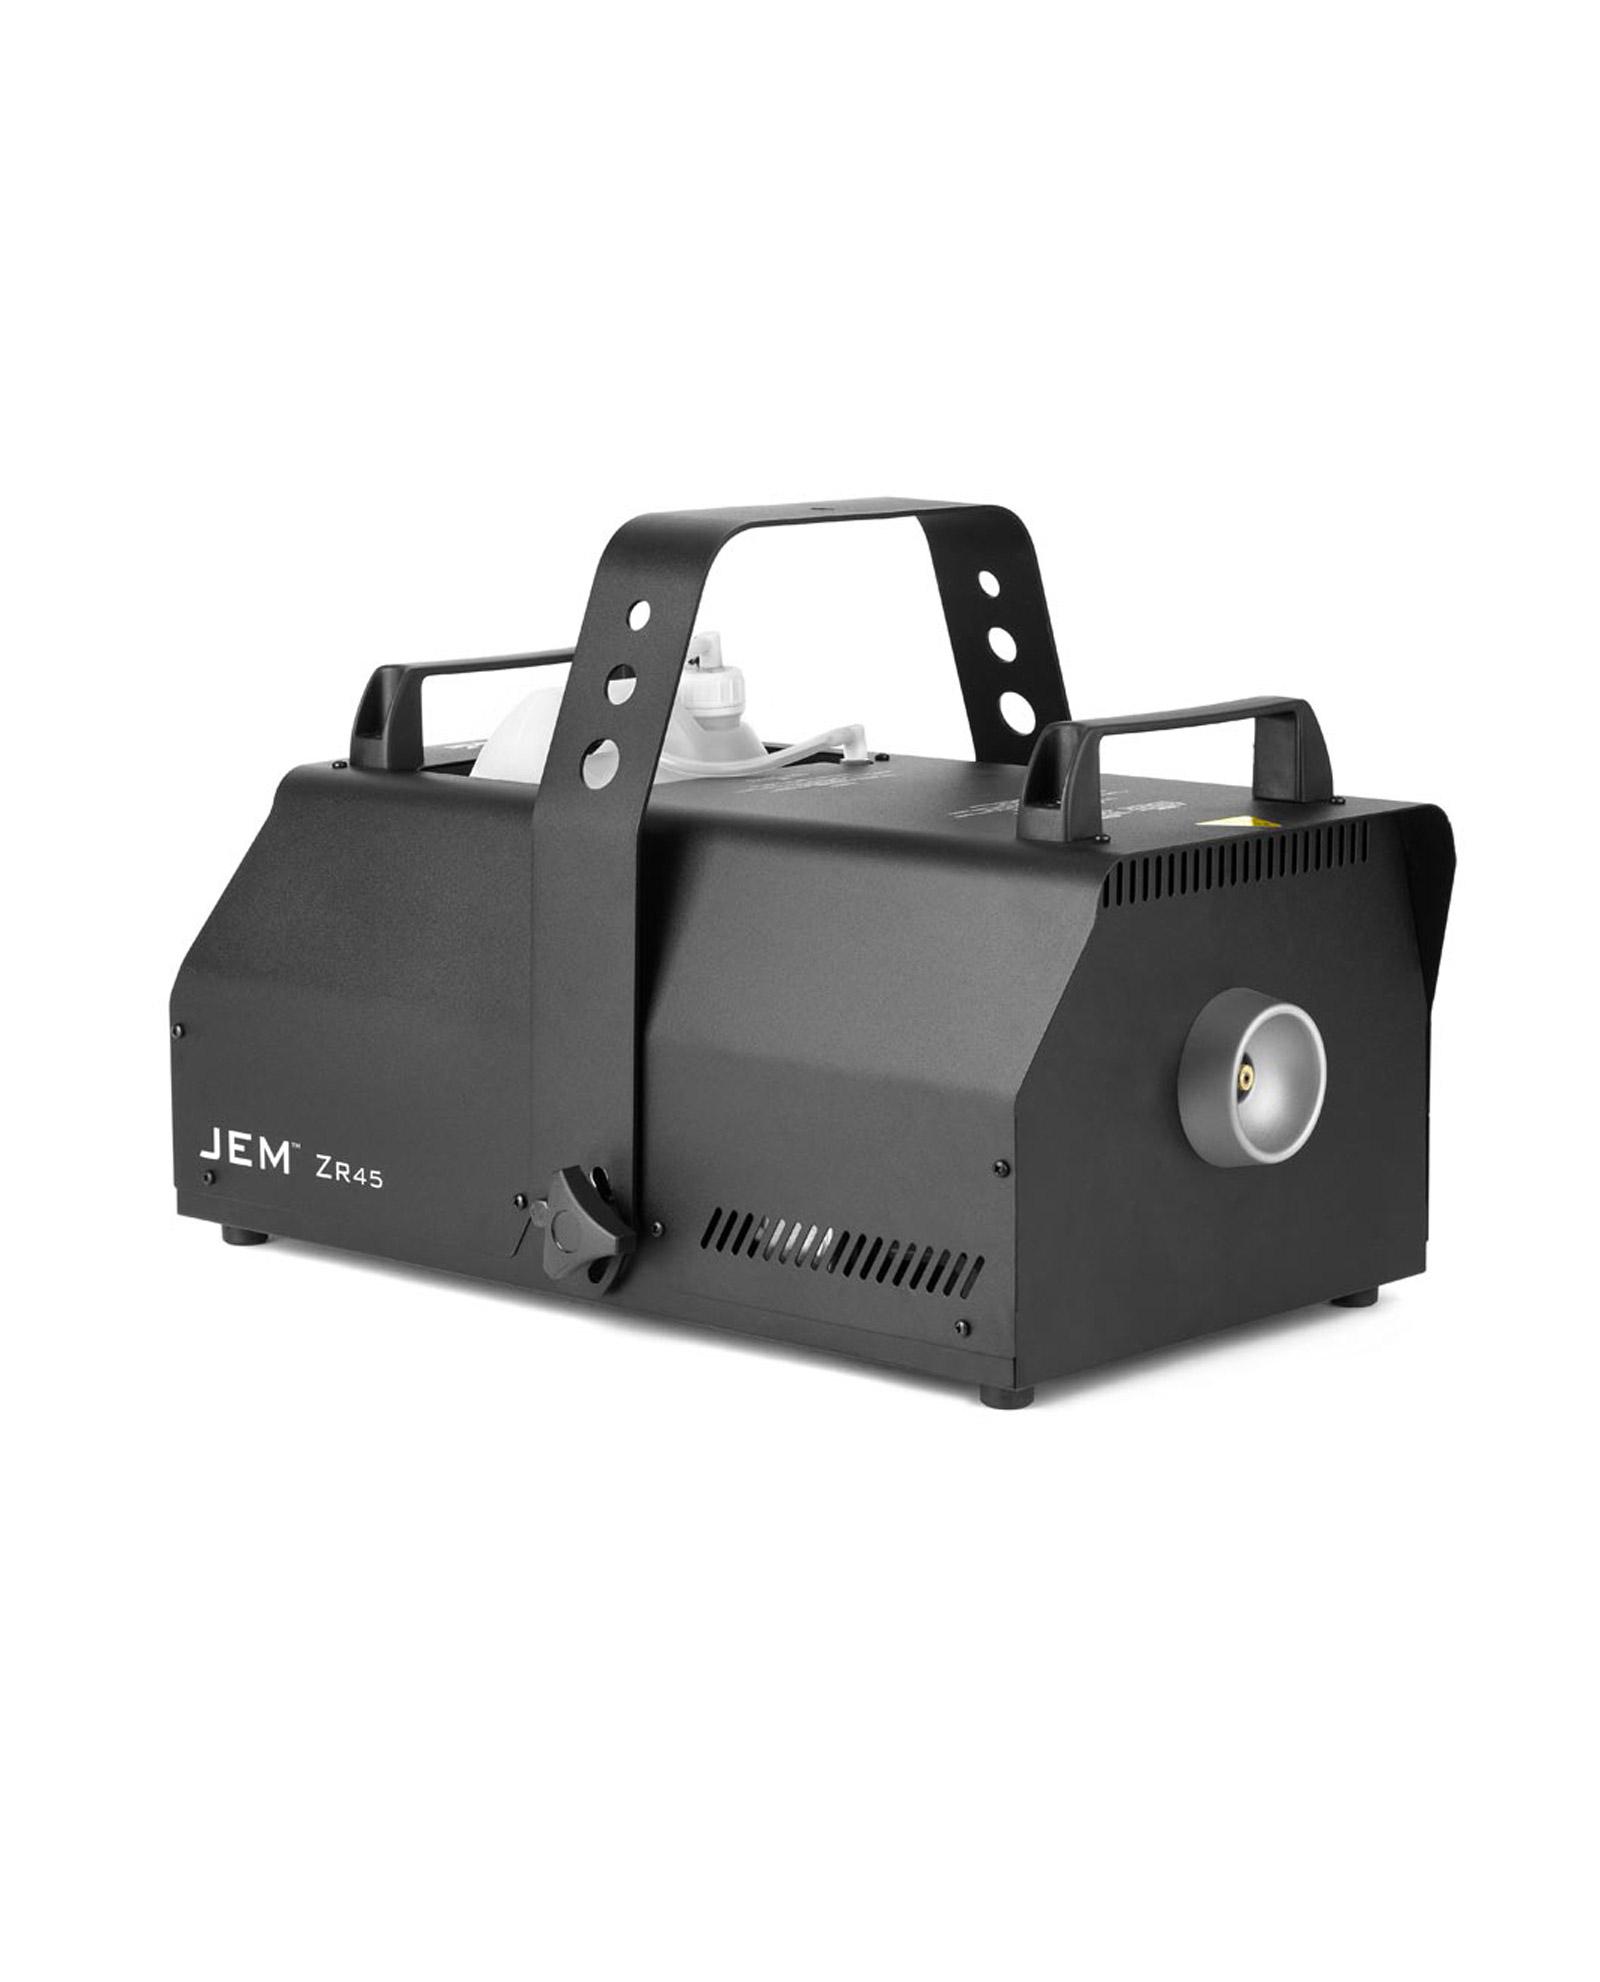 Jem Zr45 Fog Machine